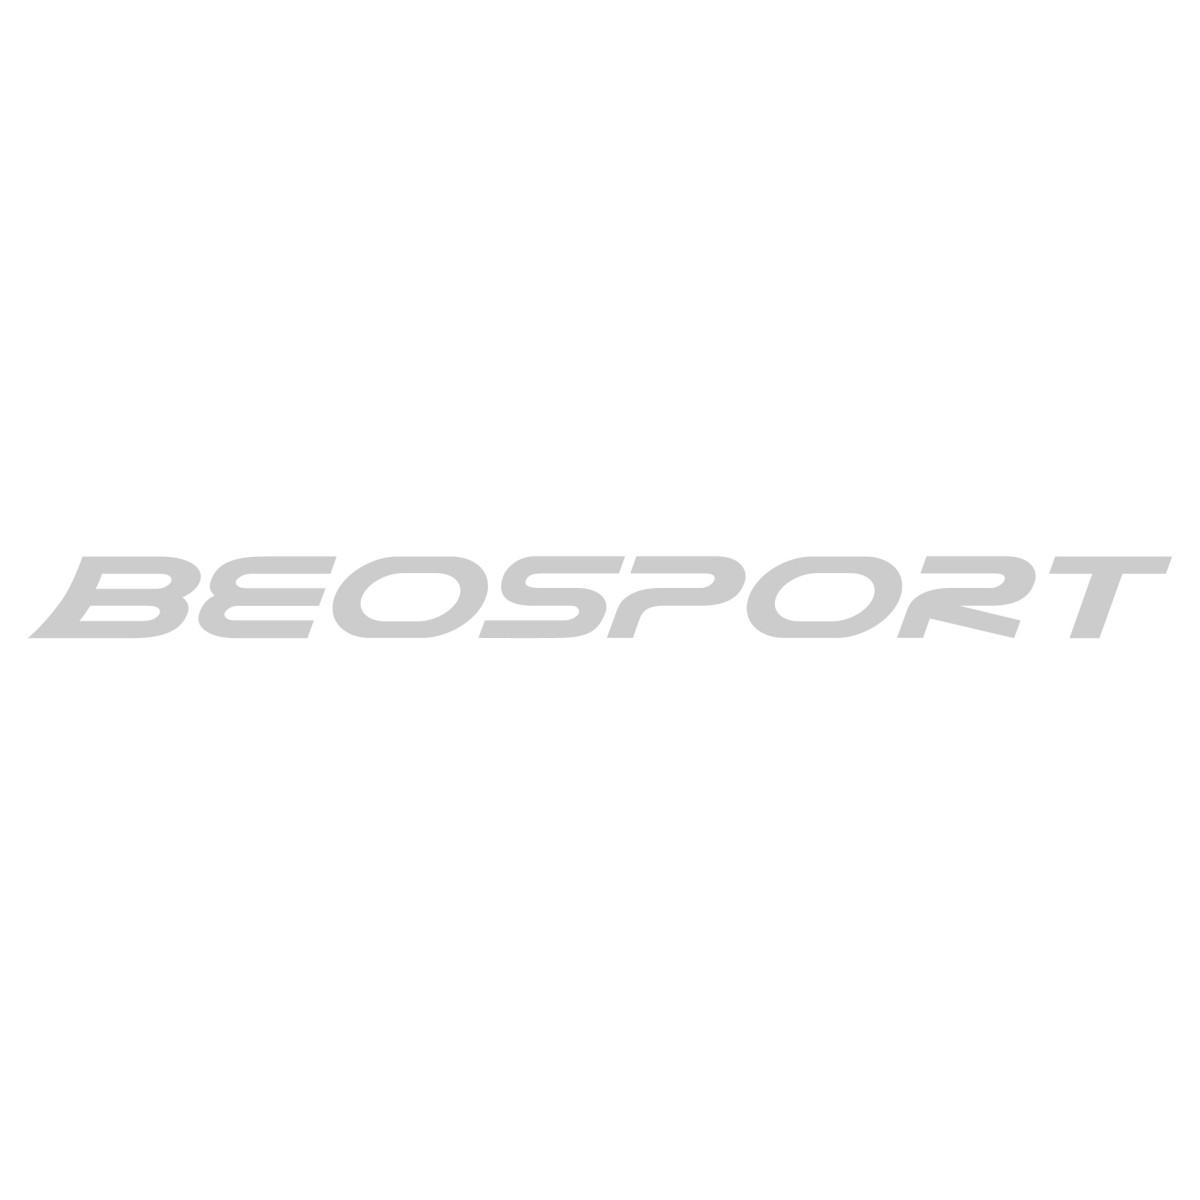 Wilson 4G Rough 1.25/200m žica za tenis